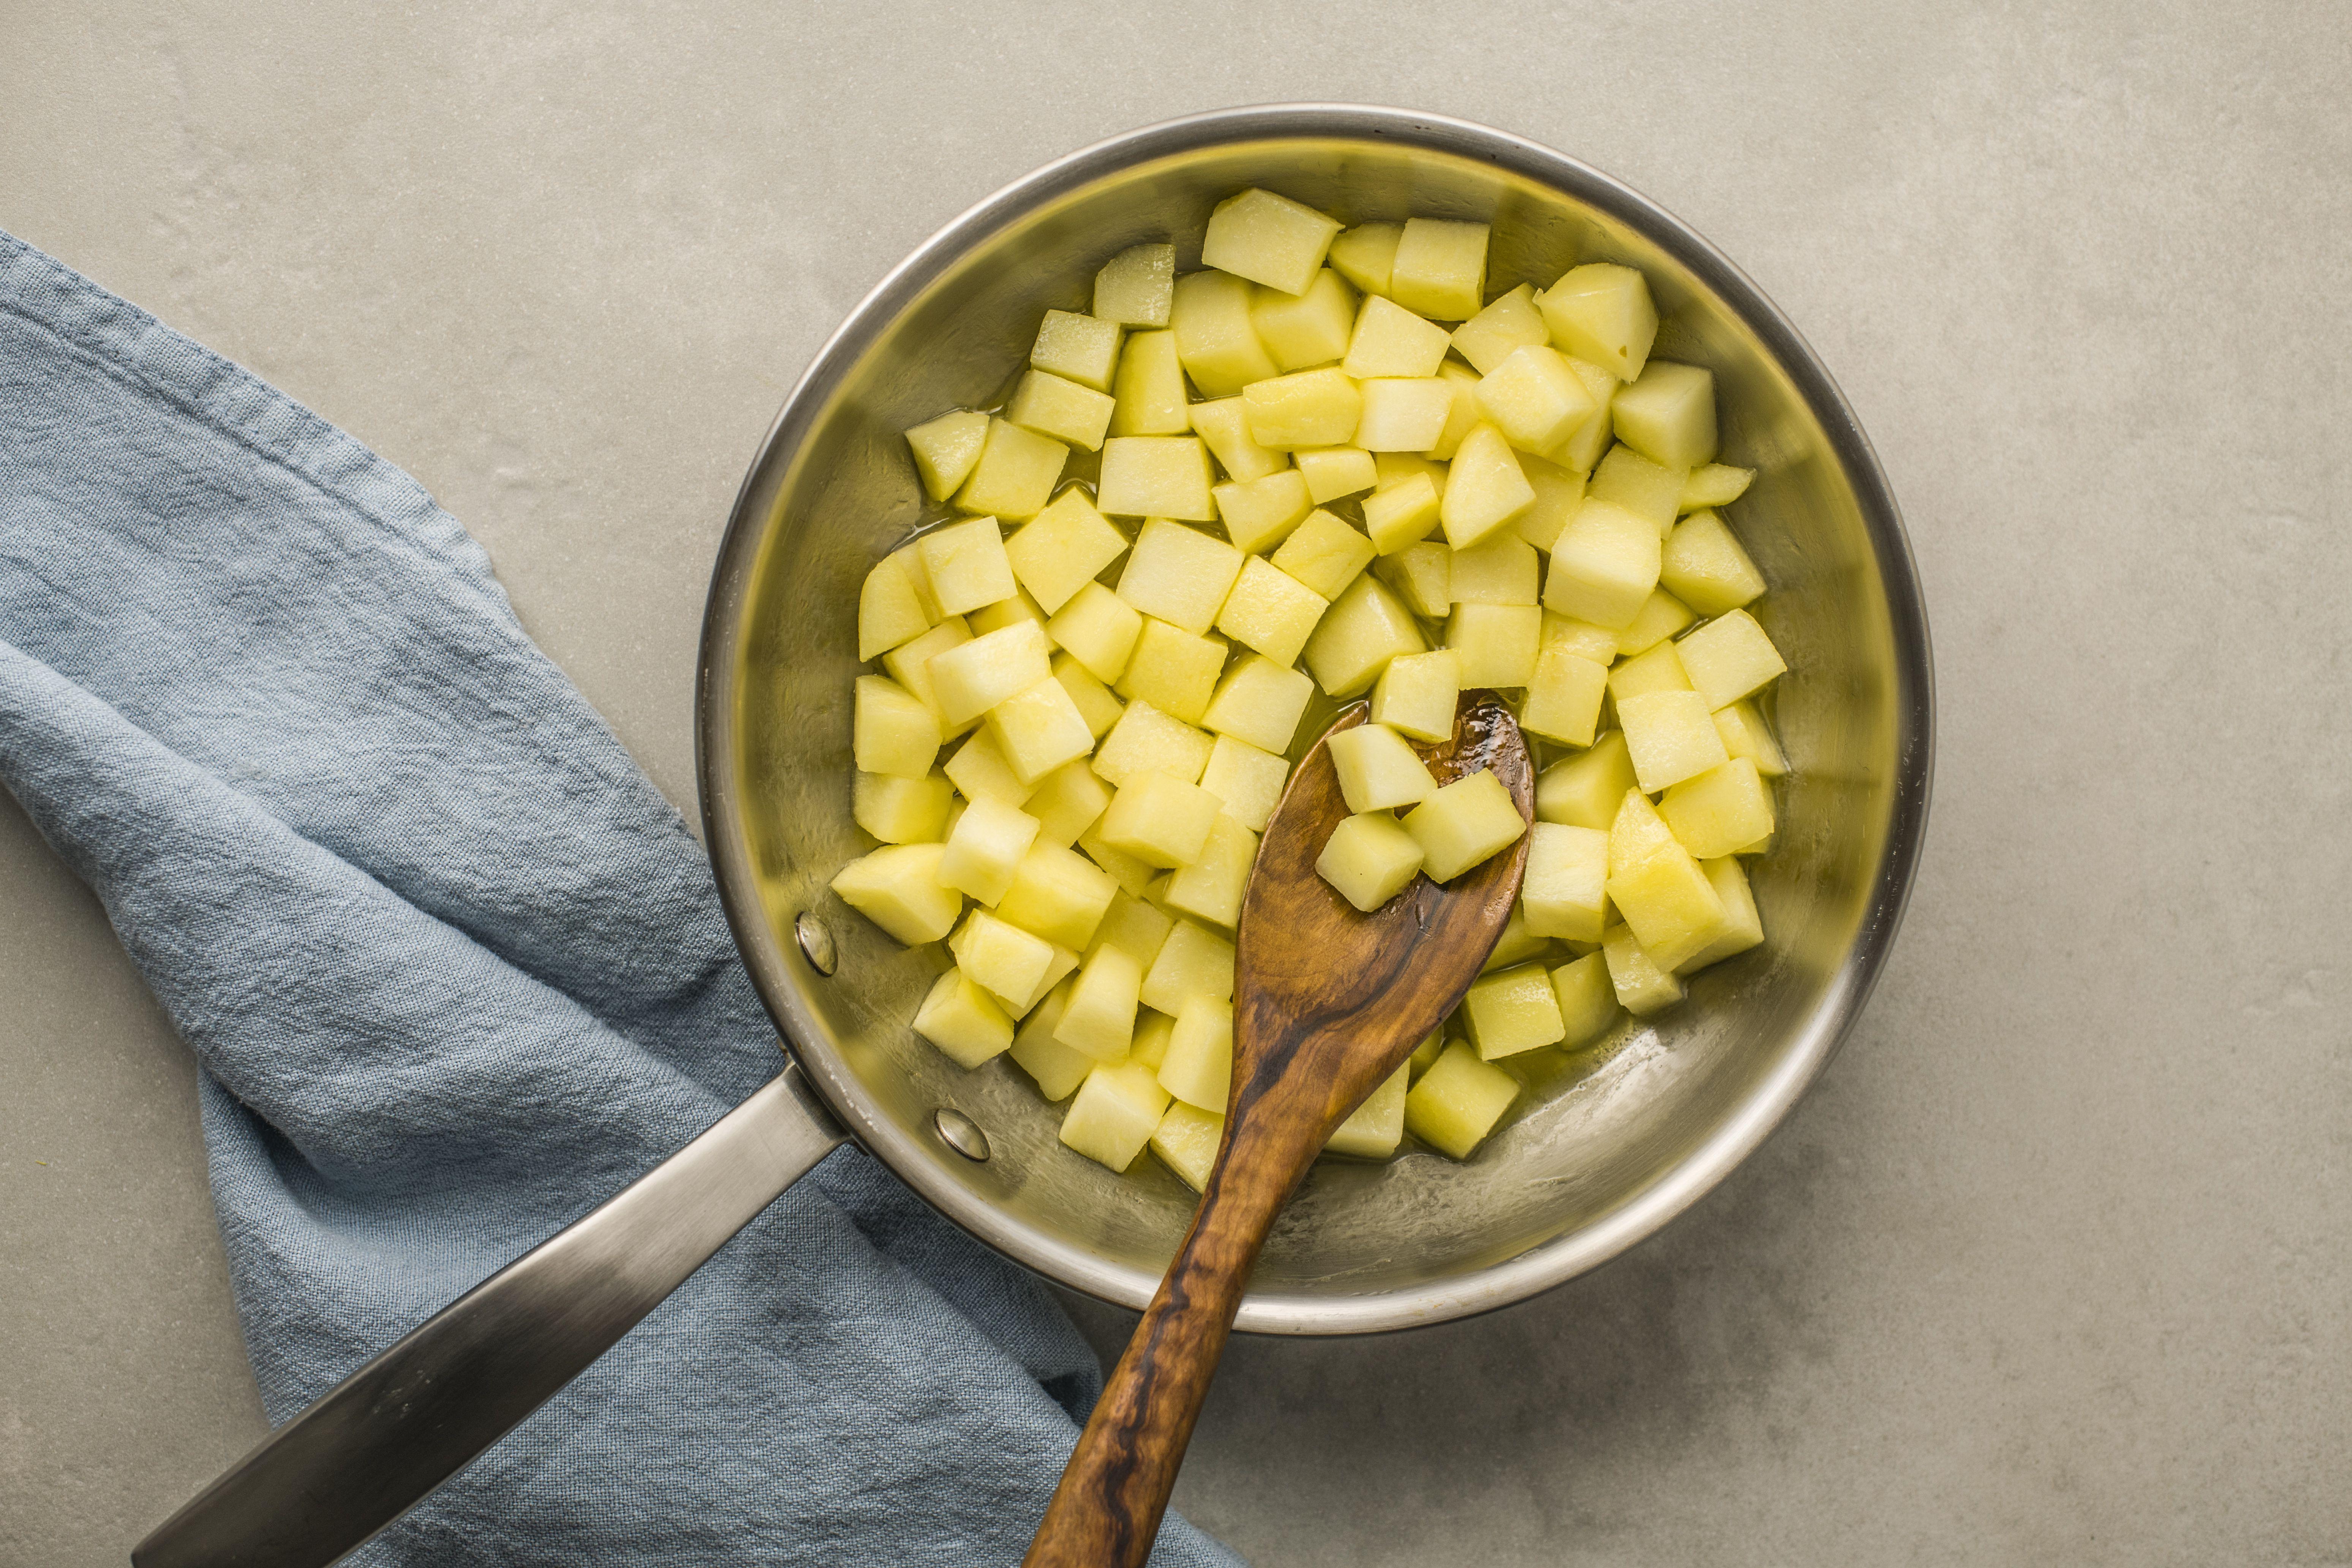 Saute the apples